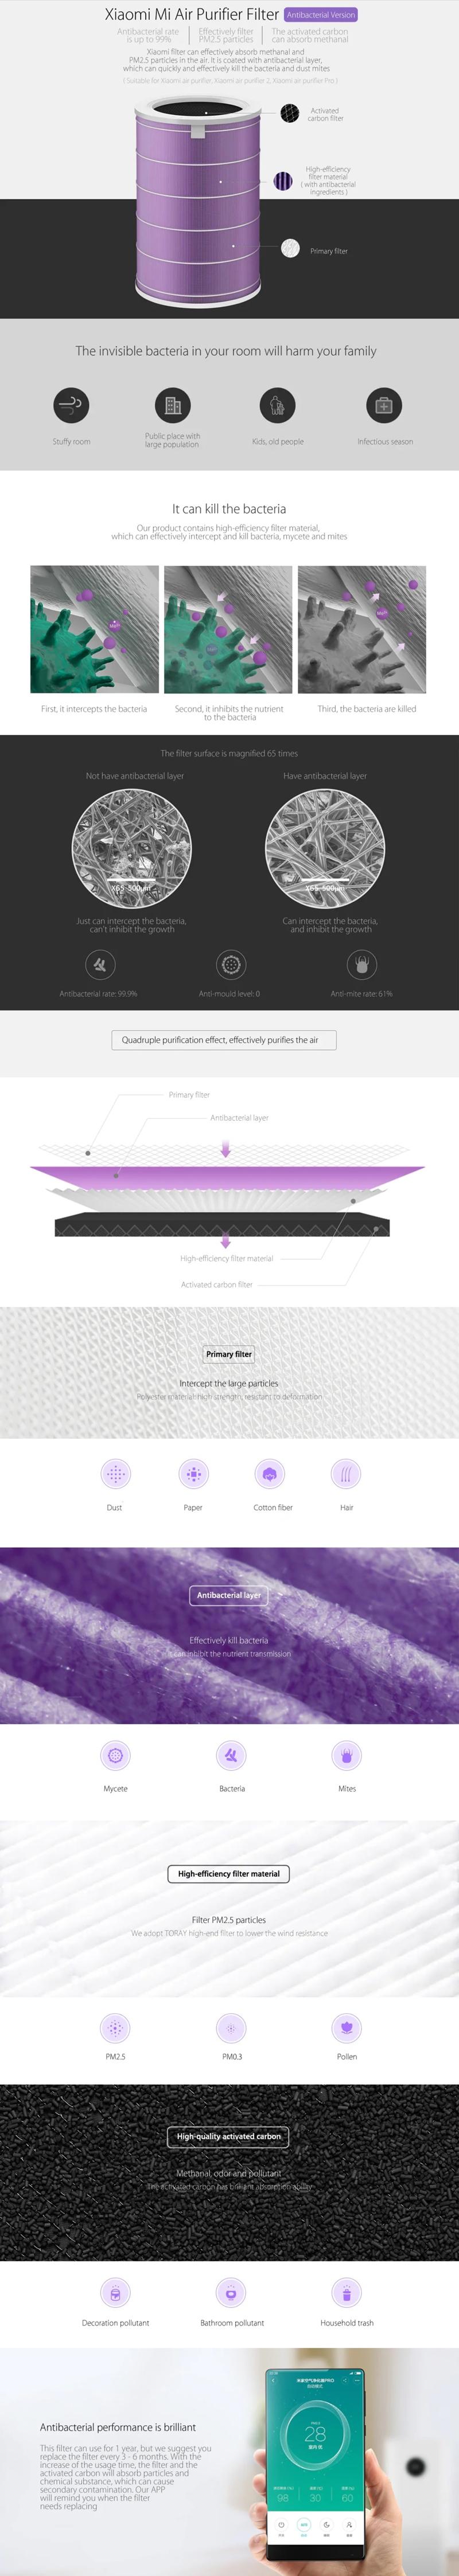 Xiaomi Air Purifier Filter Antibacterial Purple